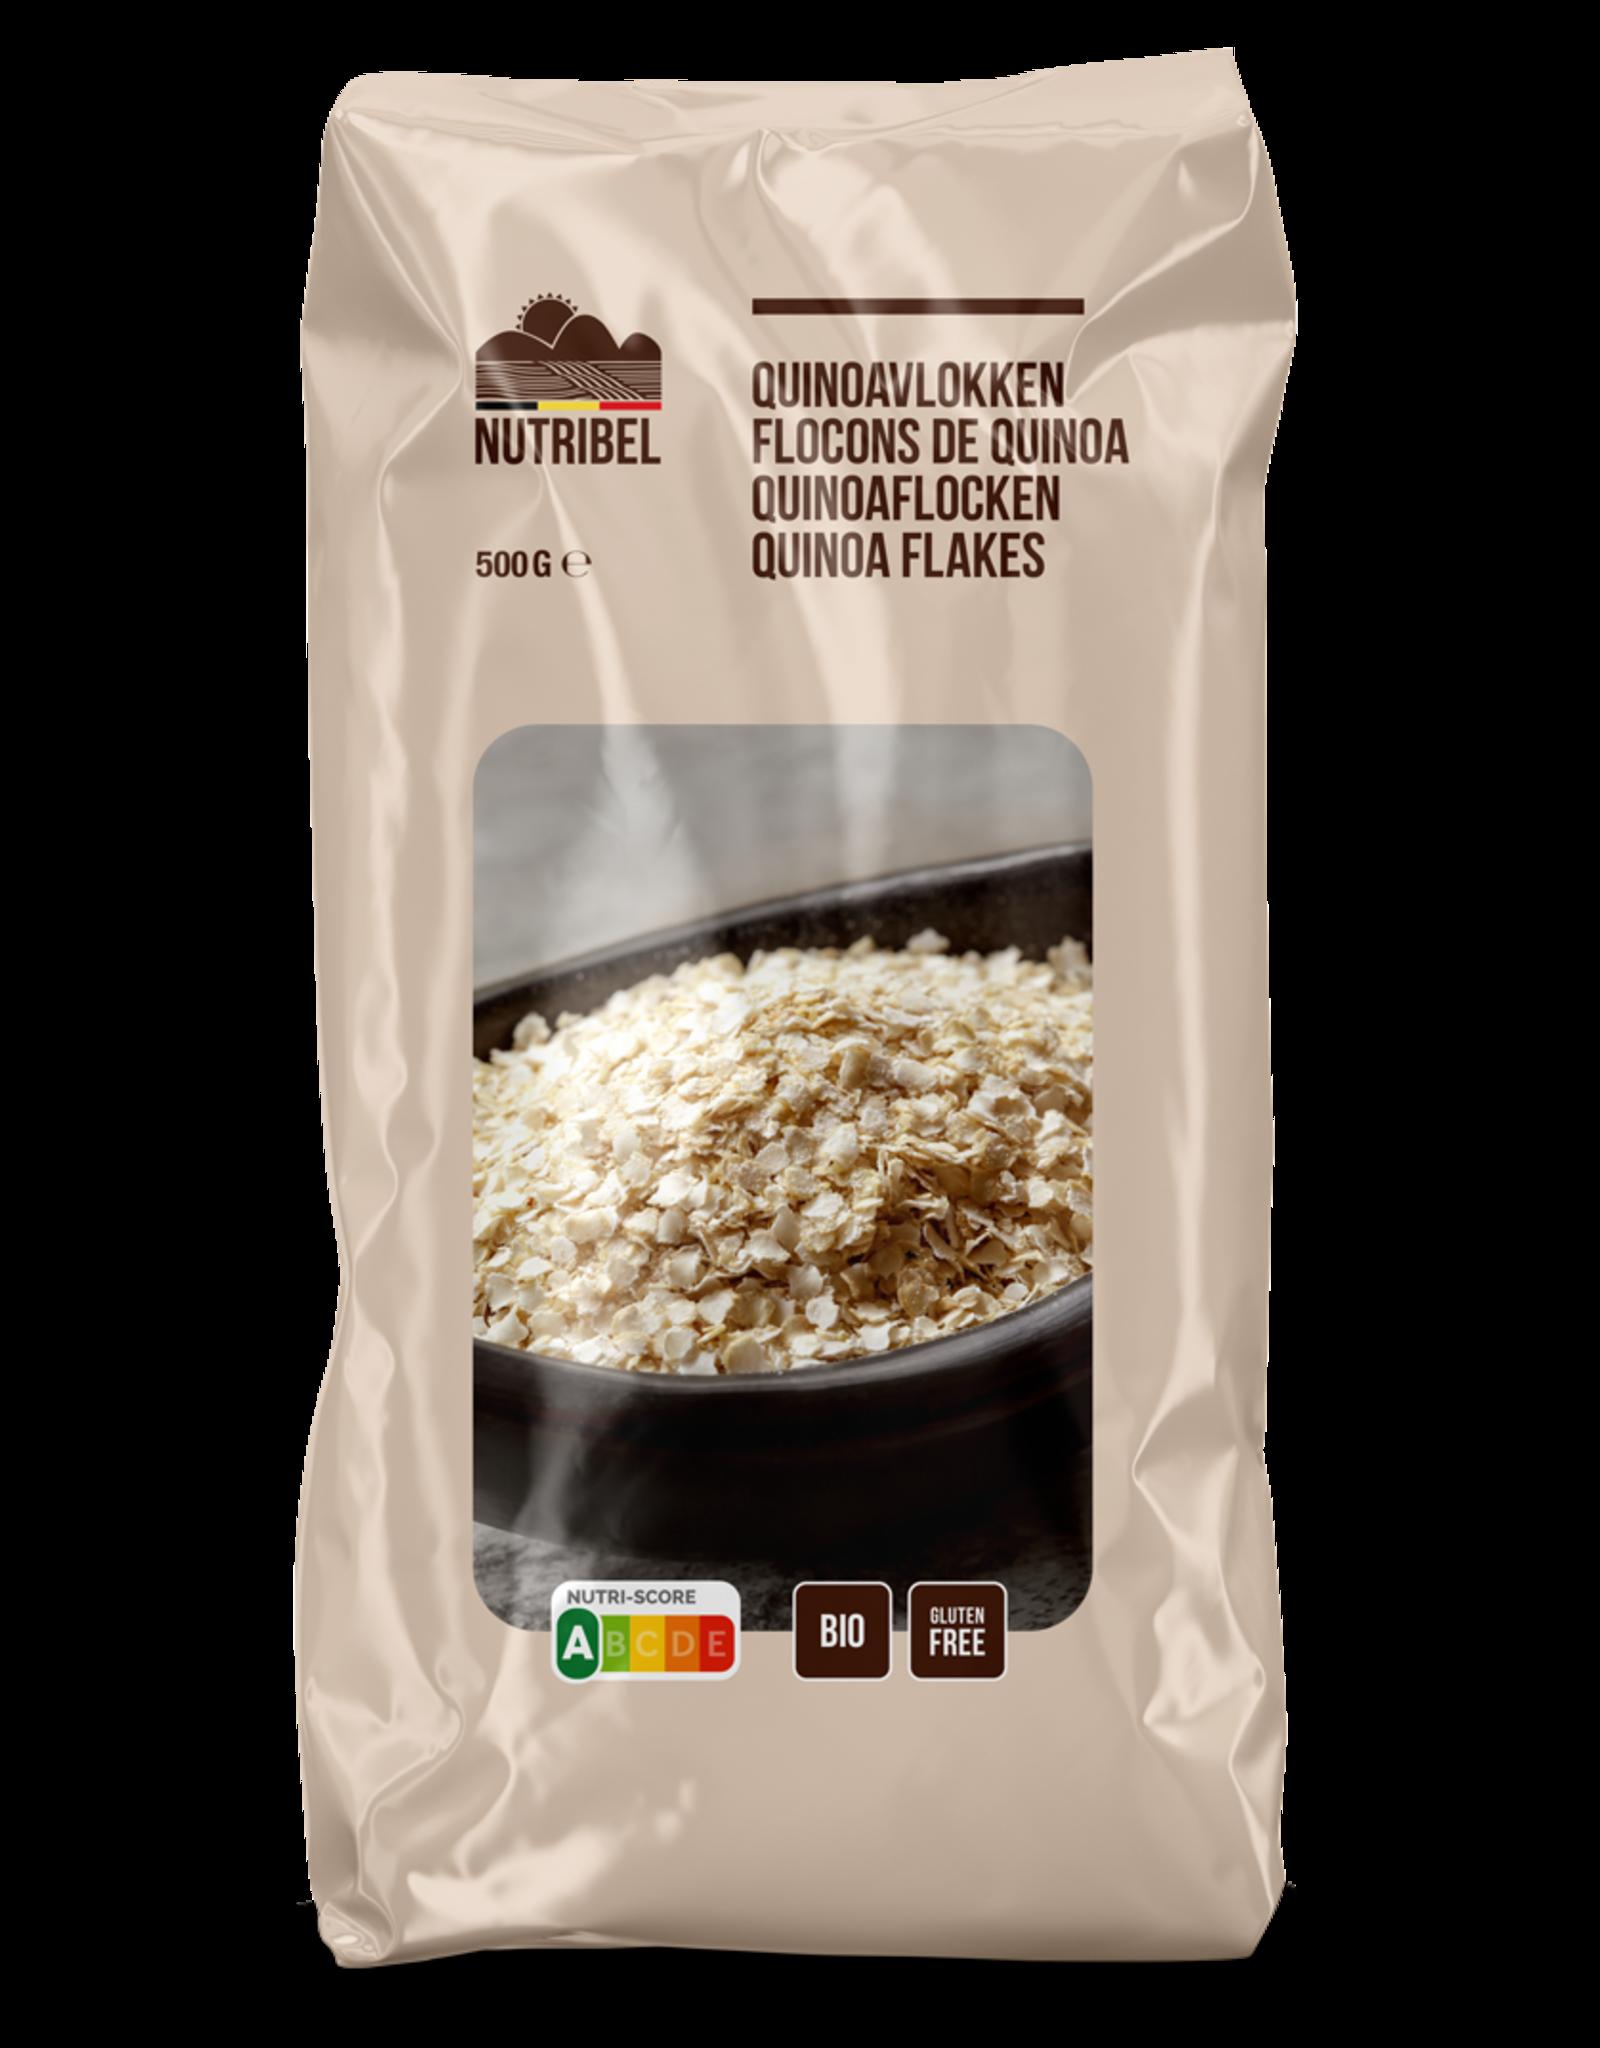 Nutribel Flocons quinoa bio & sans gluten 500g